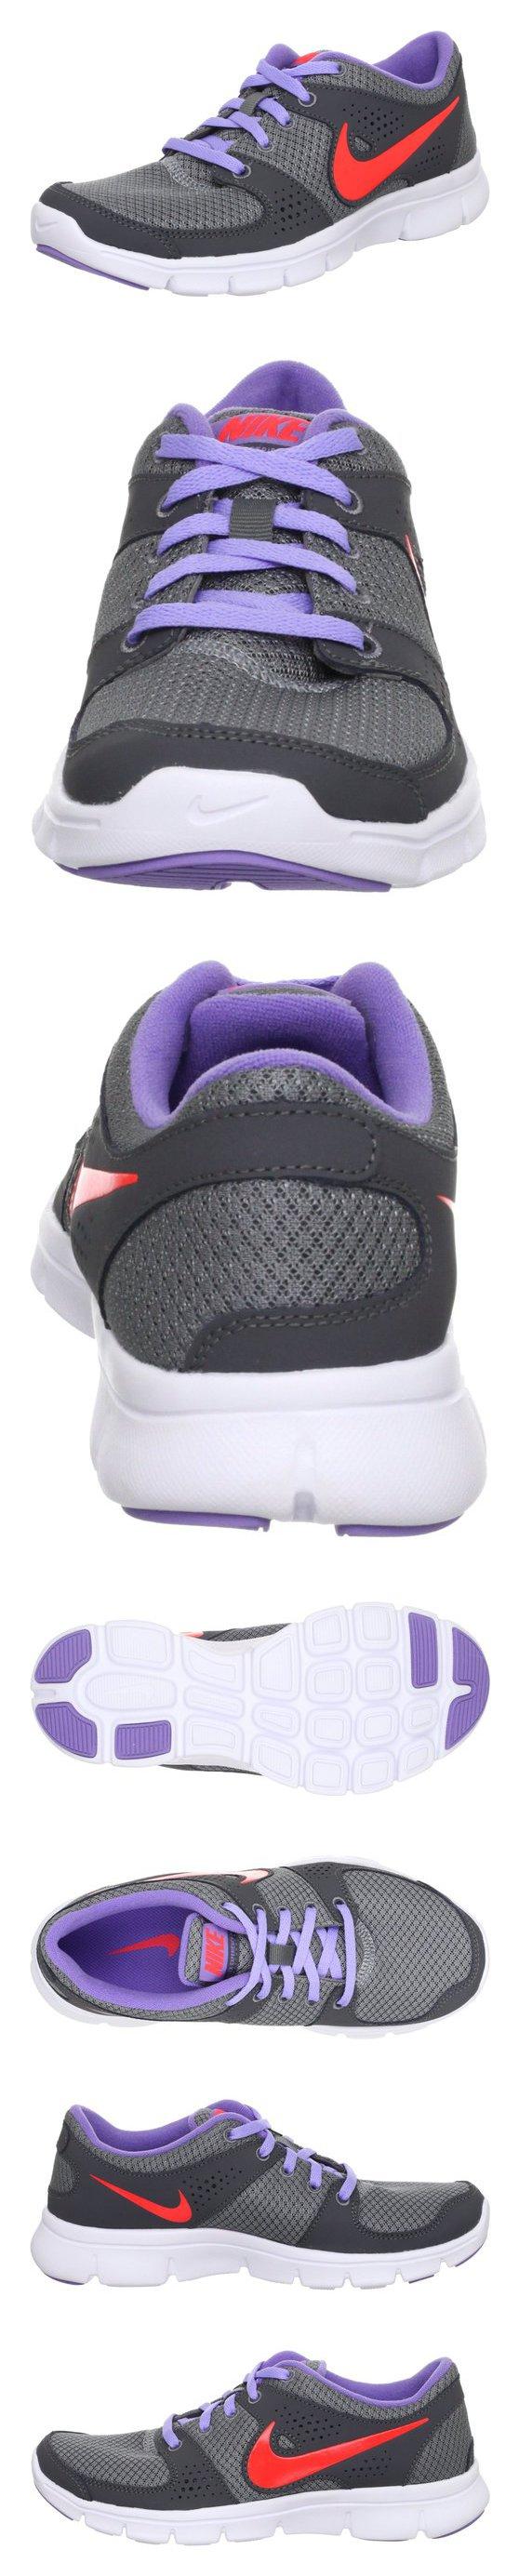 best service e7109 e7146  74.99 - Nike Flex Experience Rn Womens Style  525754-005 Size  10  shoes   nike  2012